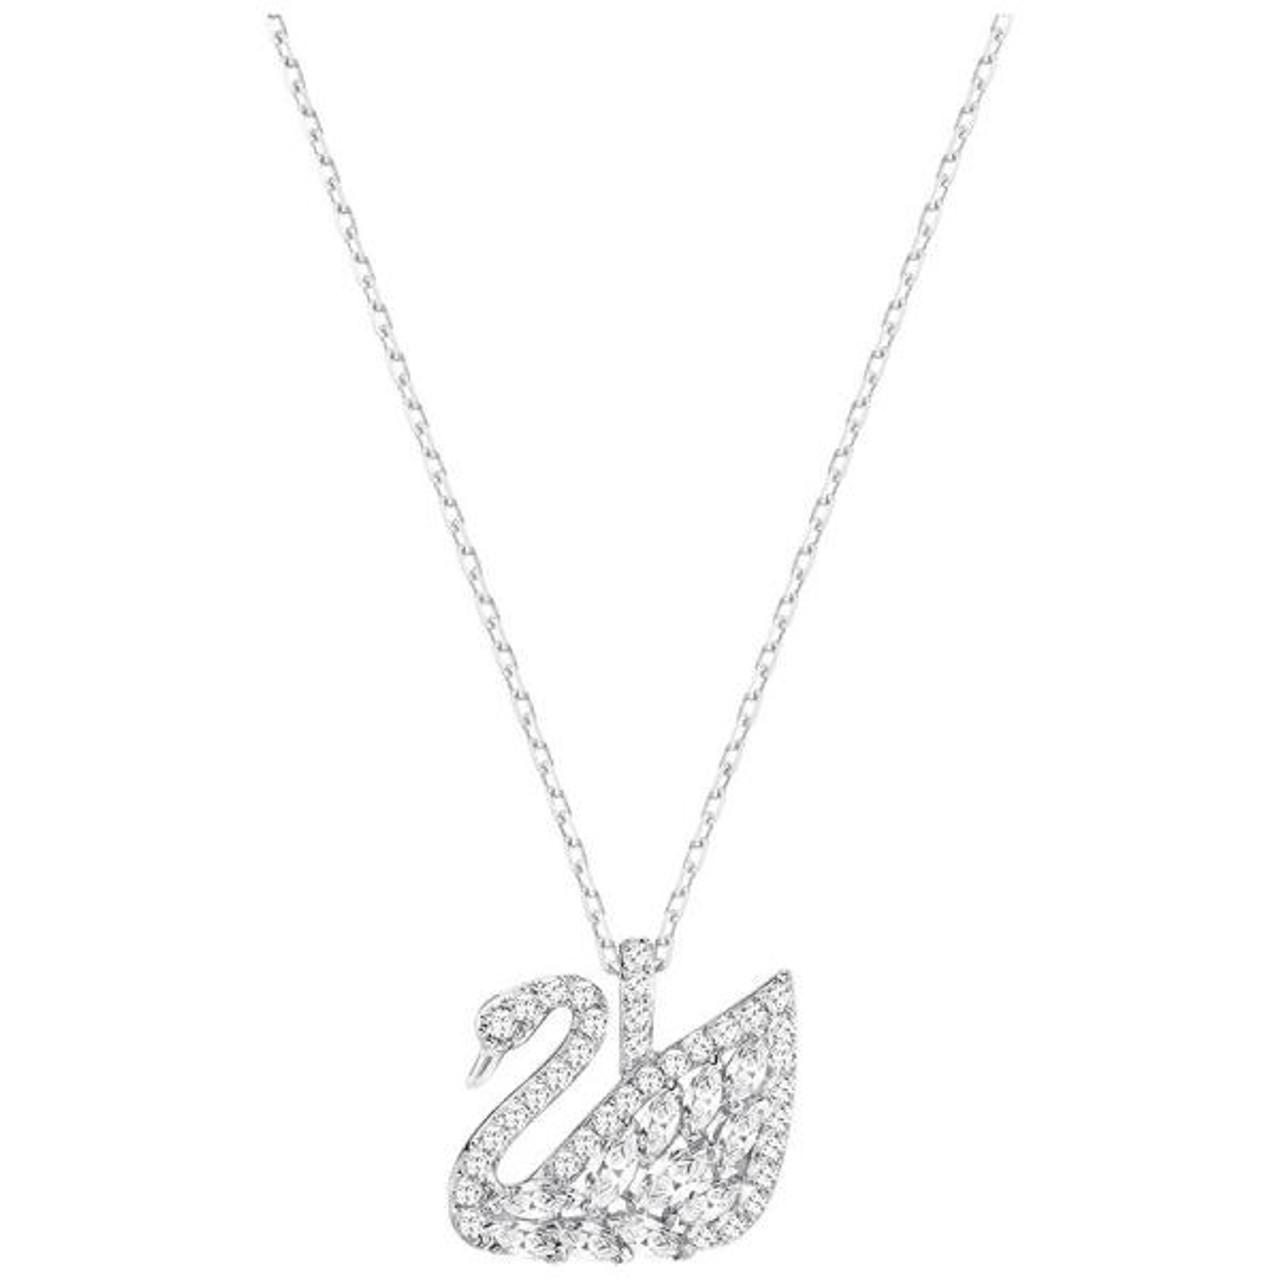 508d07620dd2 swarovski-swan-lake-small-pendant-rhodium-plated-clear-crystal -pave-5296469-2  33916.1508157700.jpg c 2 imbypass on